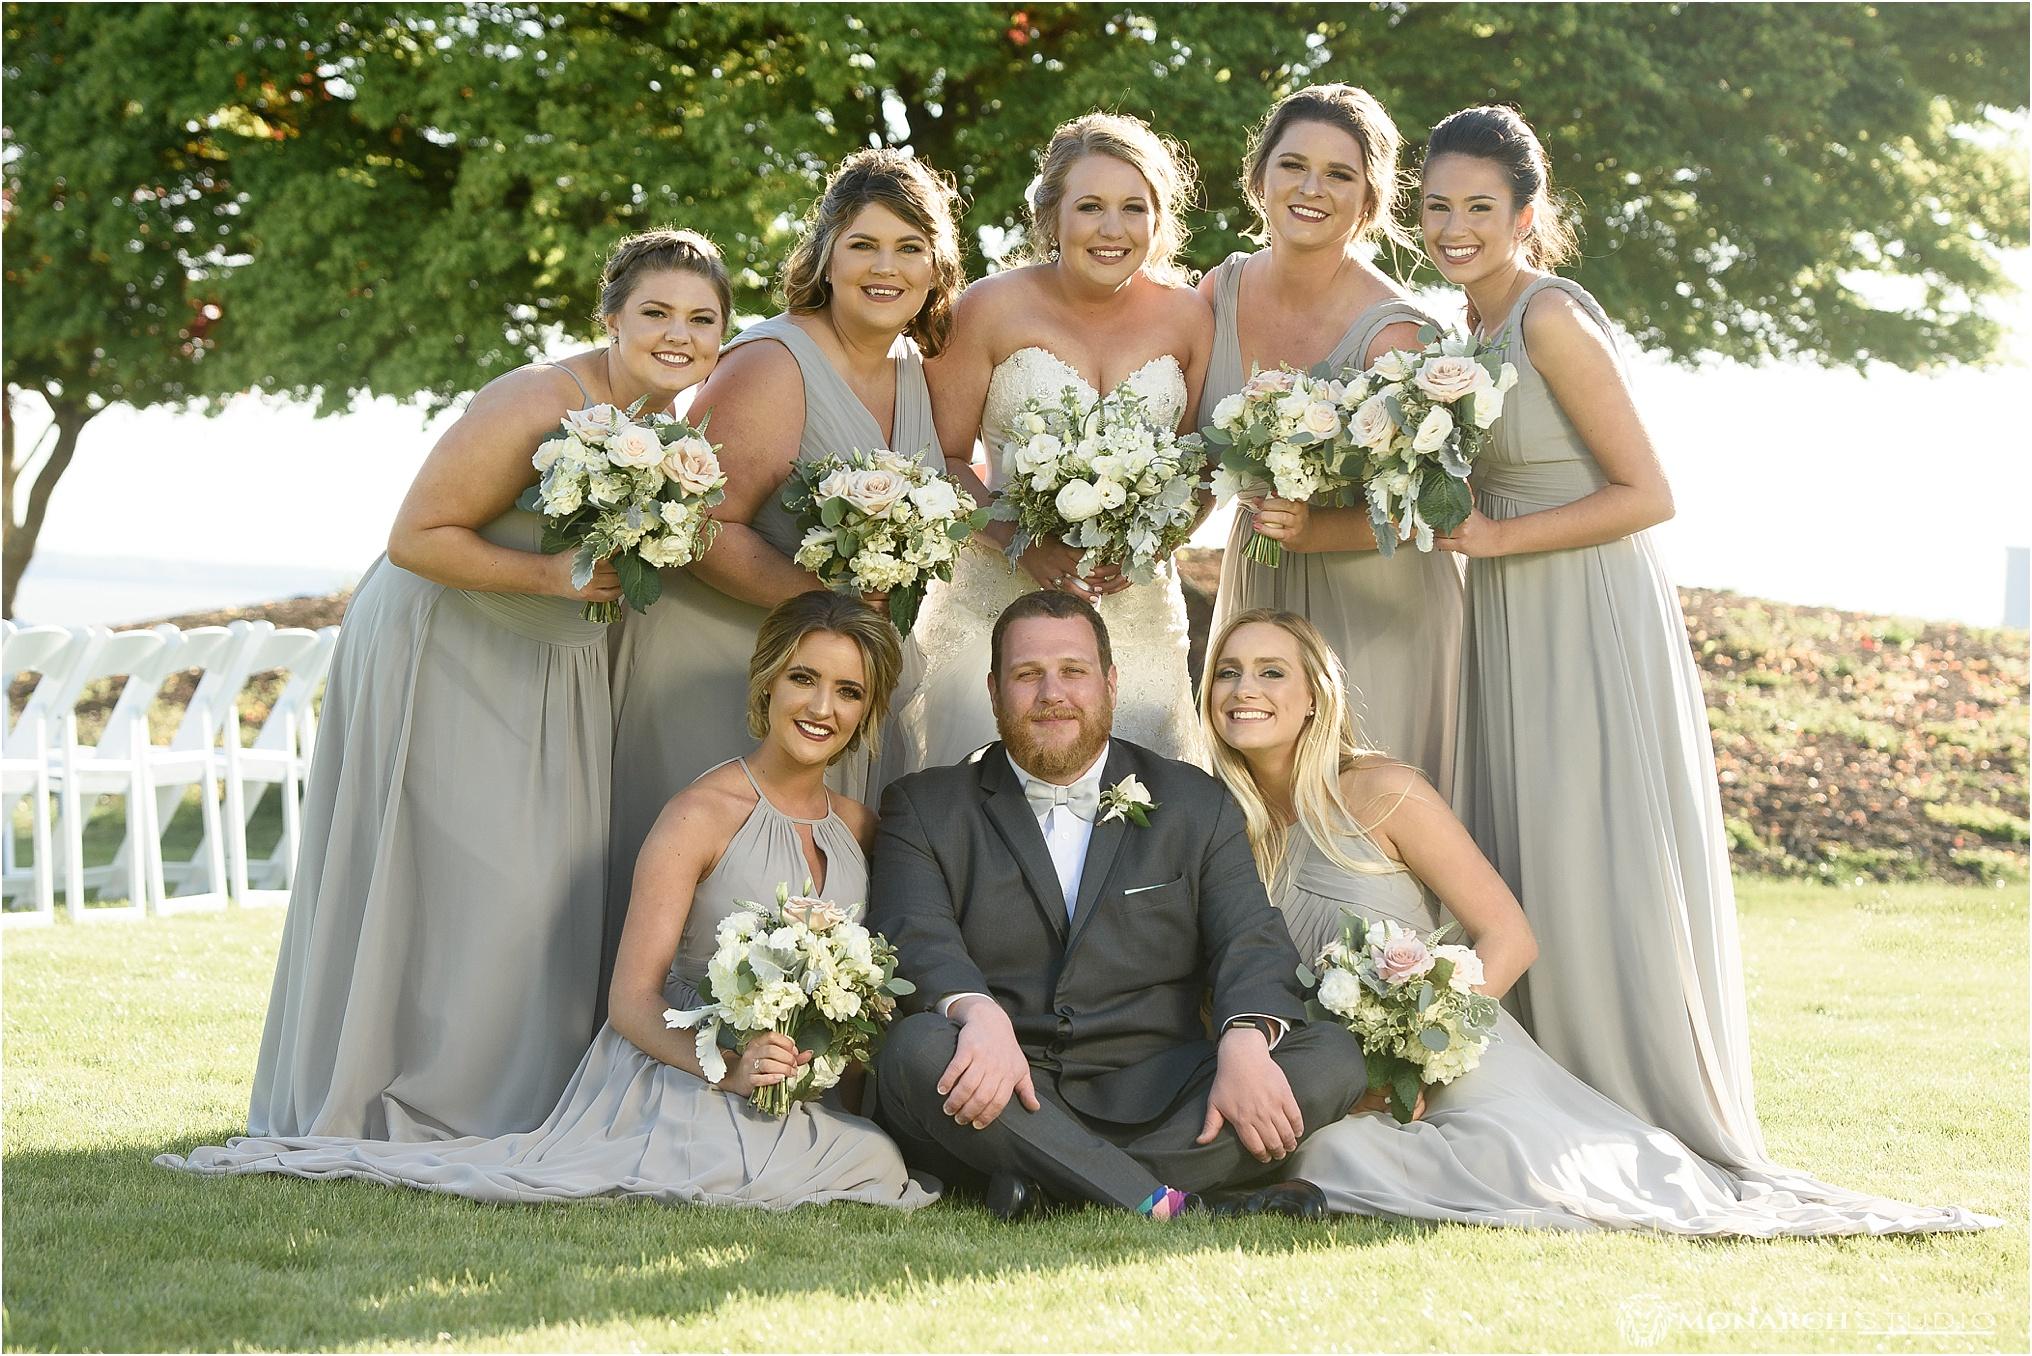 williamsburg-virginia-wedding-photographer-078.jpg